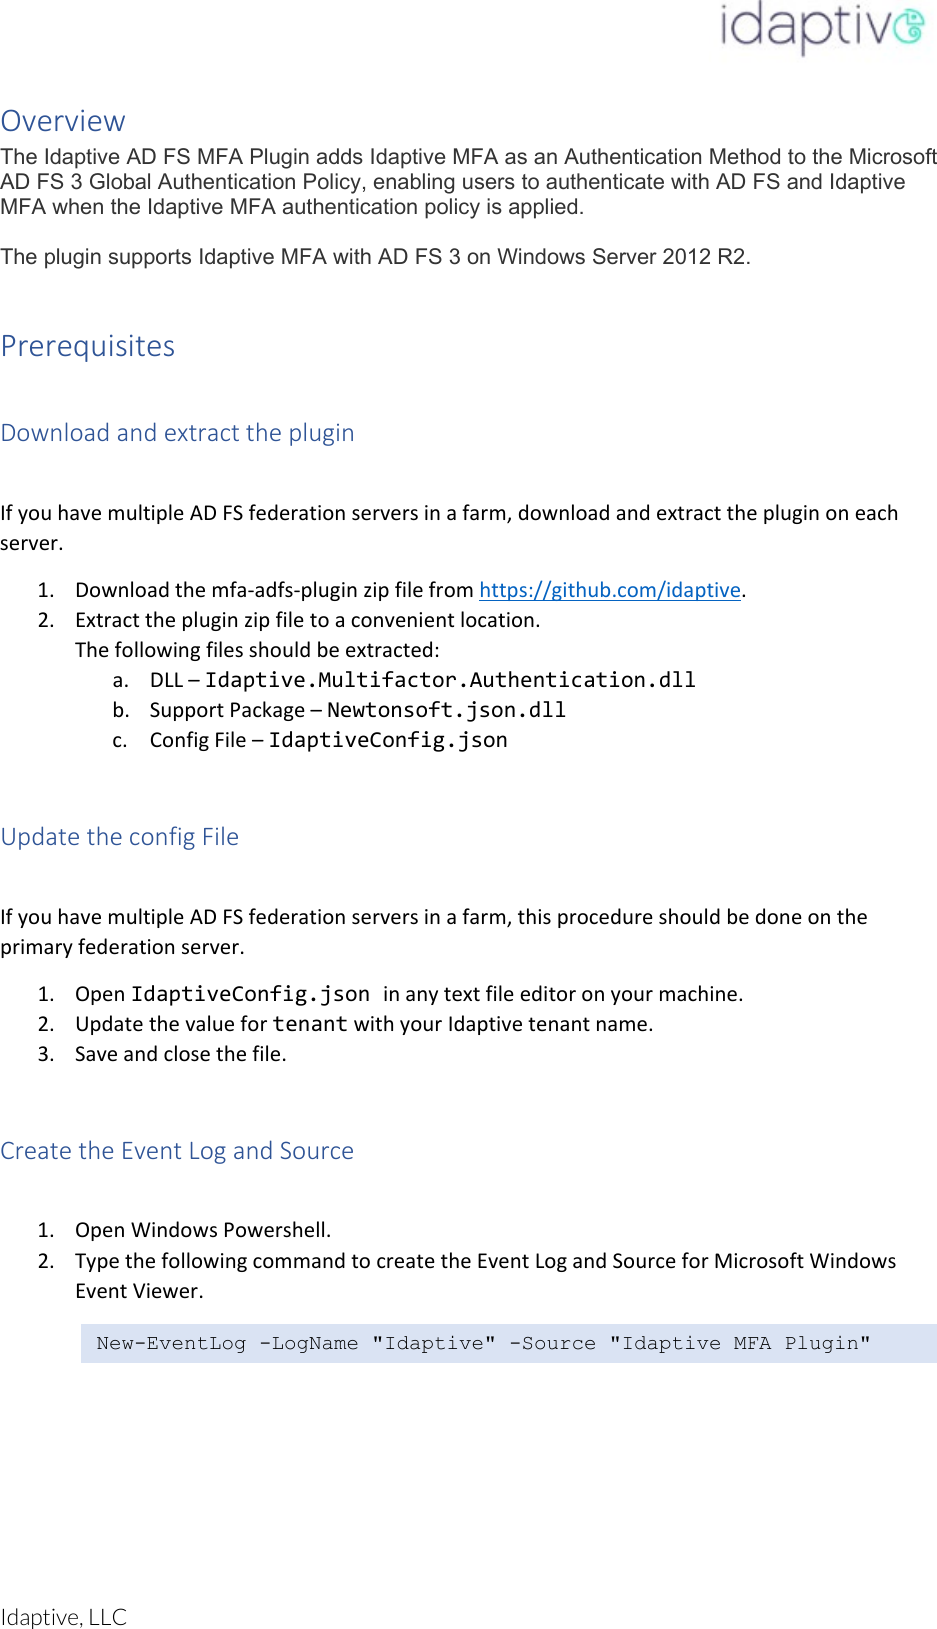 Idaptive MFA AD FS Plugin ADFS Manual